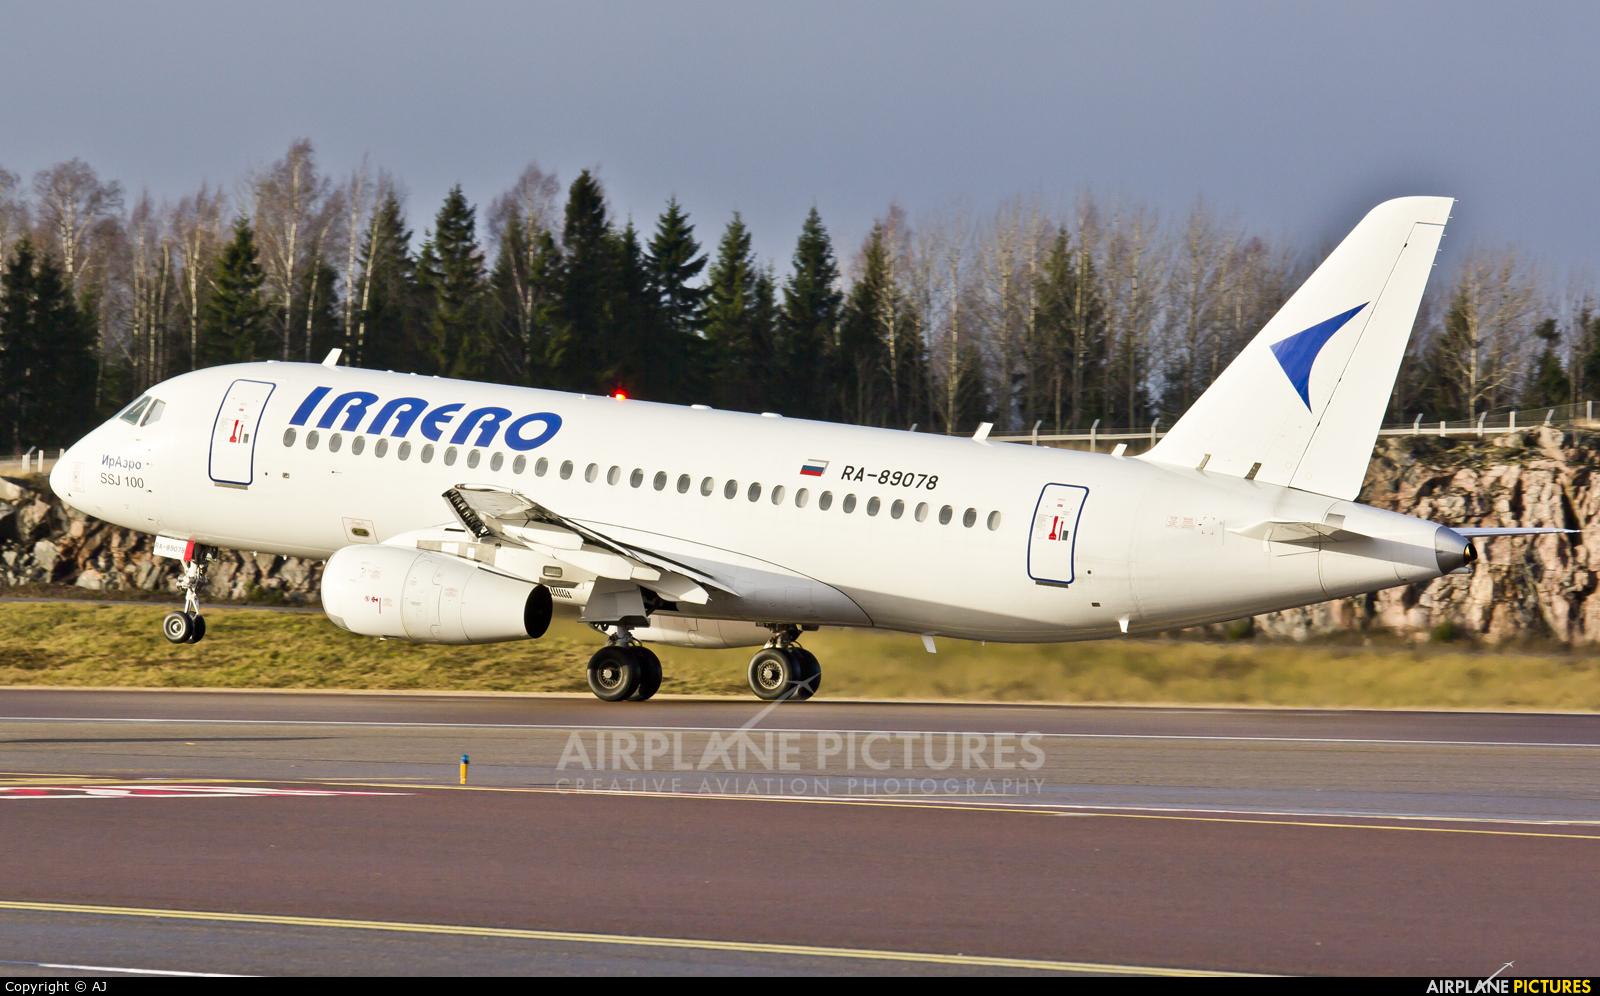 Iraero RA-89078 aircraft at Helsinki - Vantaa